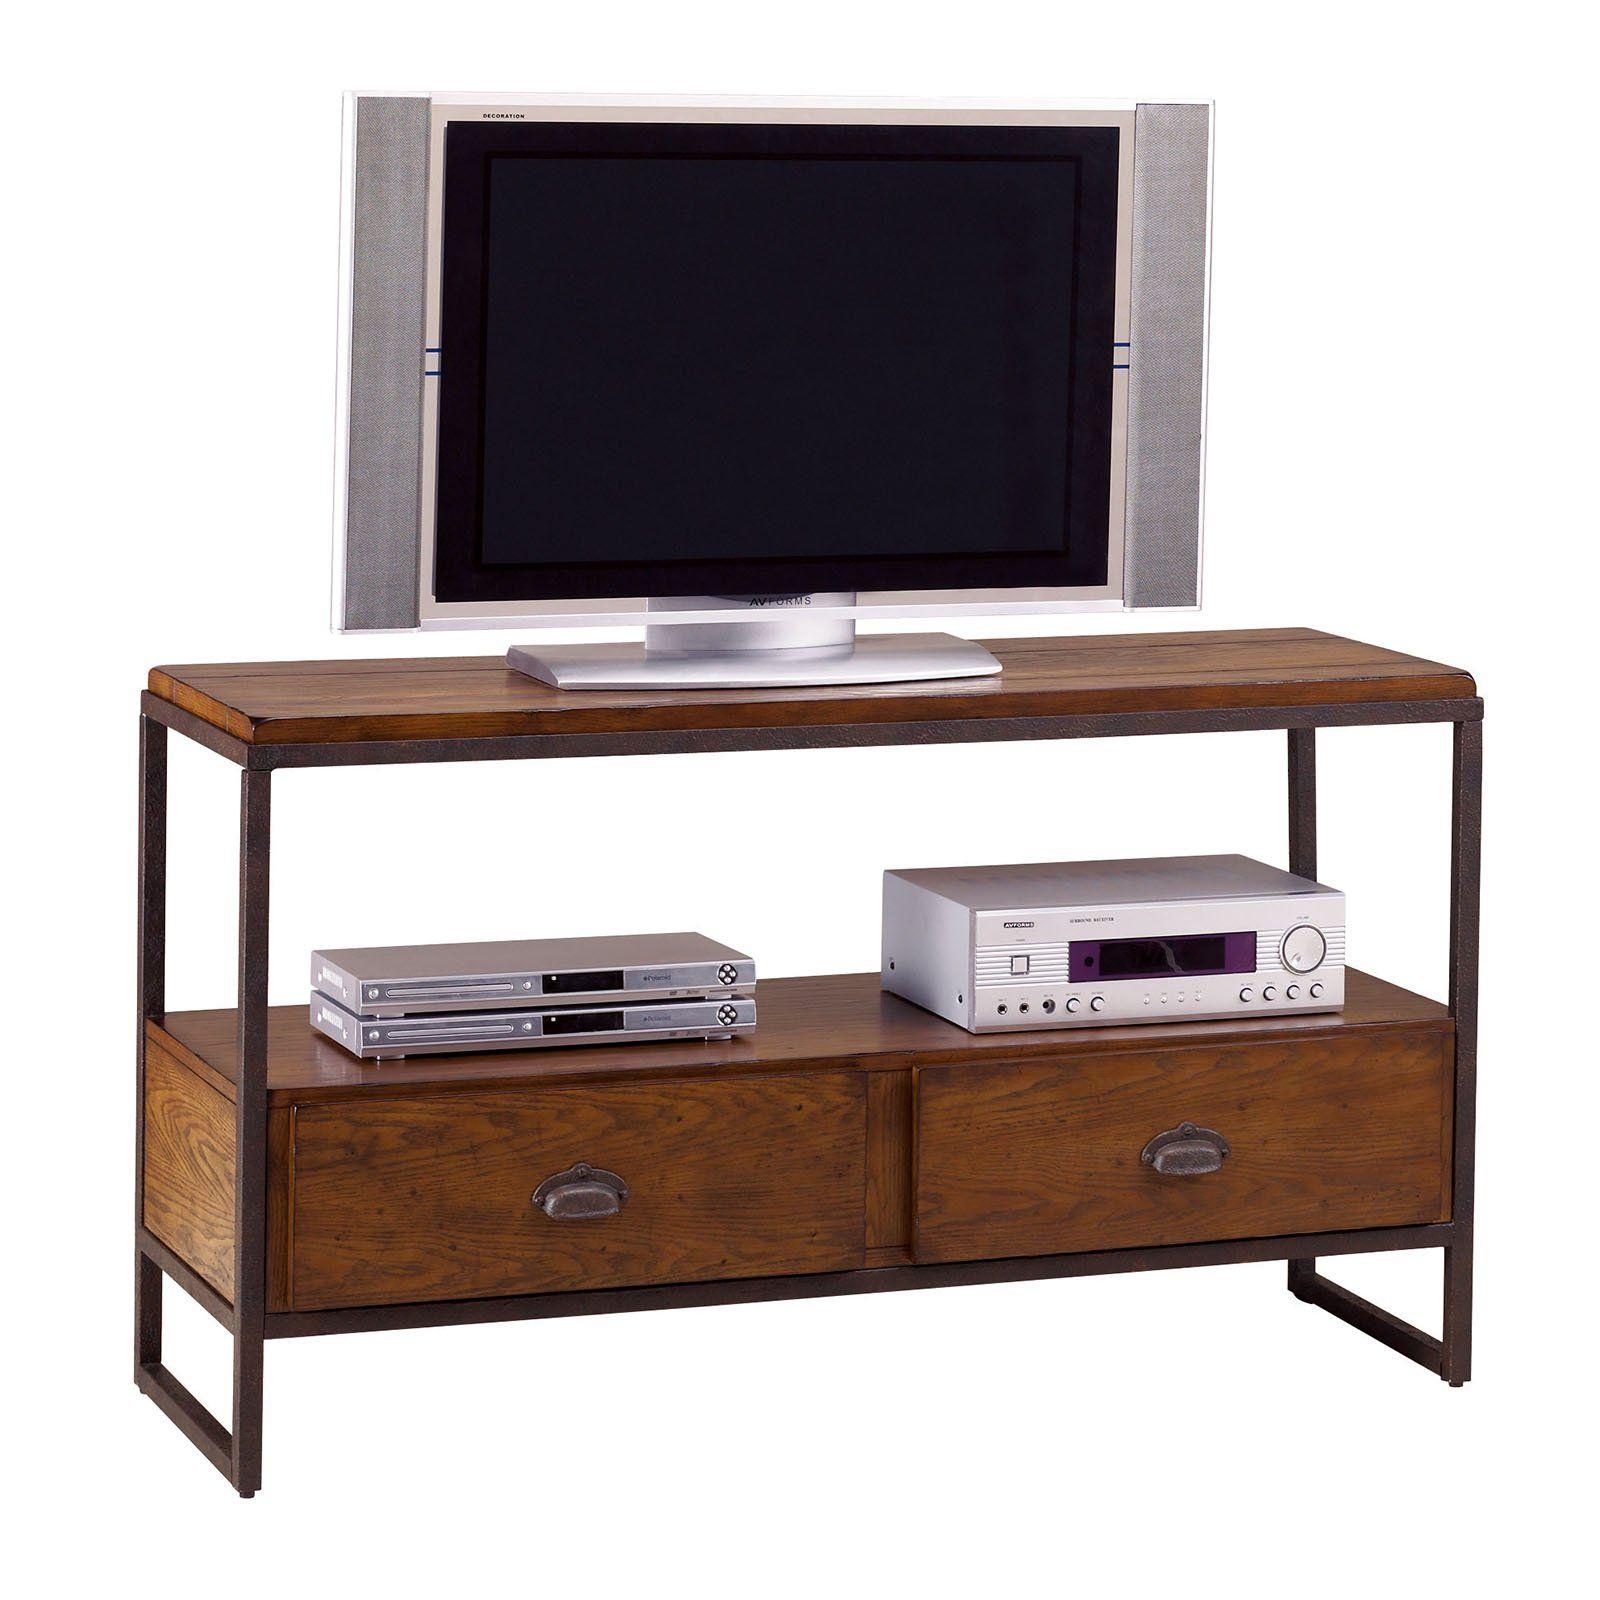 Hammary Baja T2075286 00 Entertainment Console Table Ikea House Besi [ 1600 x 1600 Pixel ]